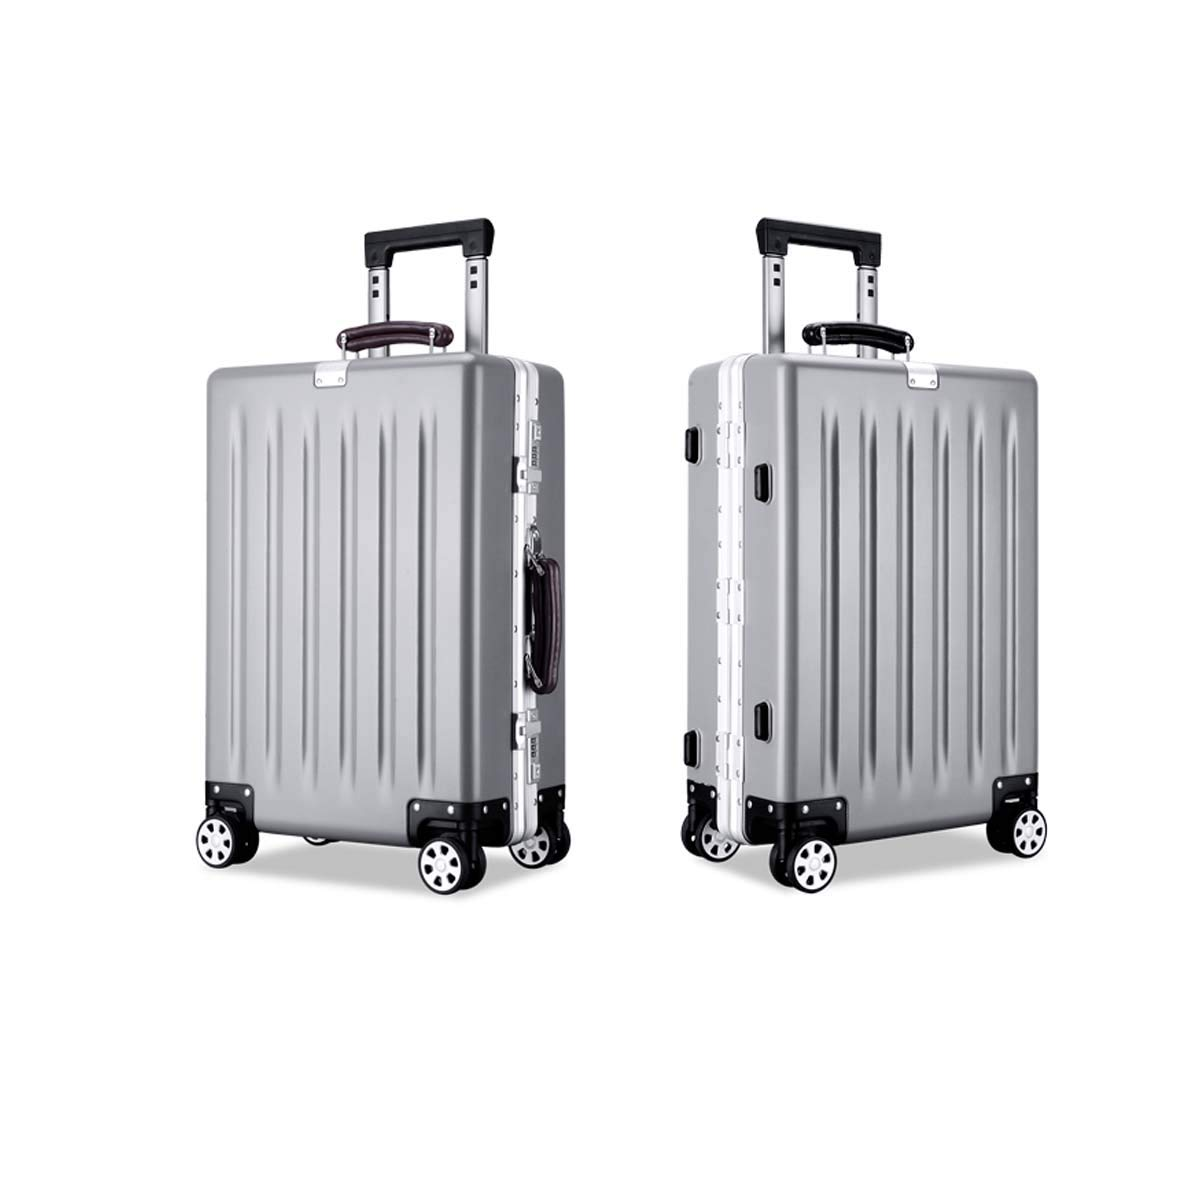 Bahaowenjuguan キャリングスーツケース ハードケース 回転スーツケース トロリーケース トラベルオーガナイザー シンプル 21/25インチ ブラック グレー サイズ 25 B07KV16YN3